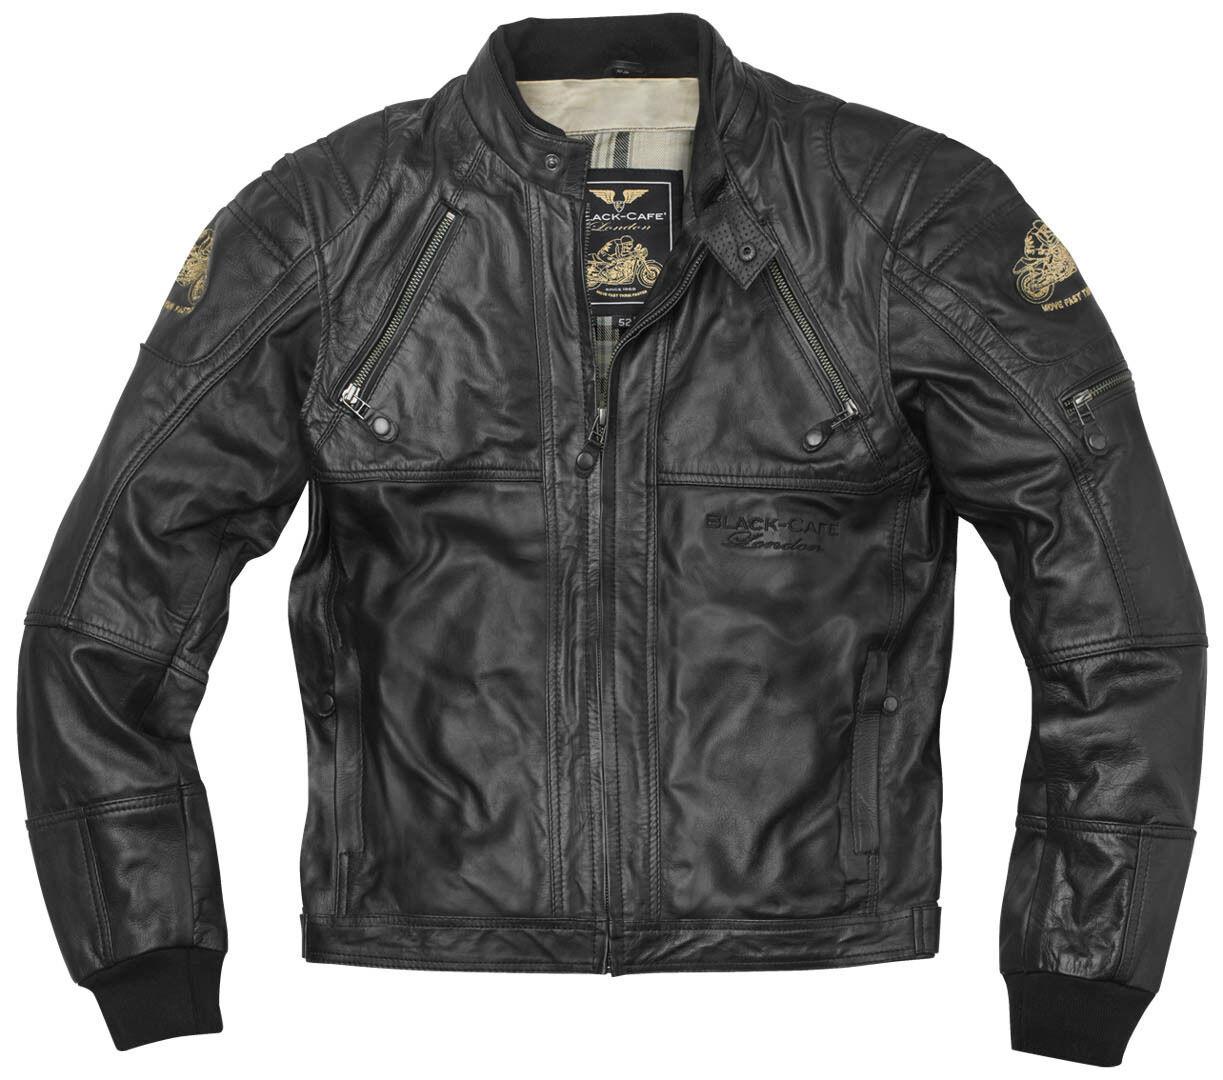 Black-Cafe London Dallas Veste en cuir de moto Noir taille : 52